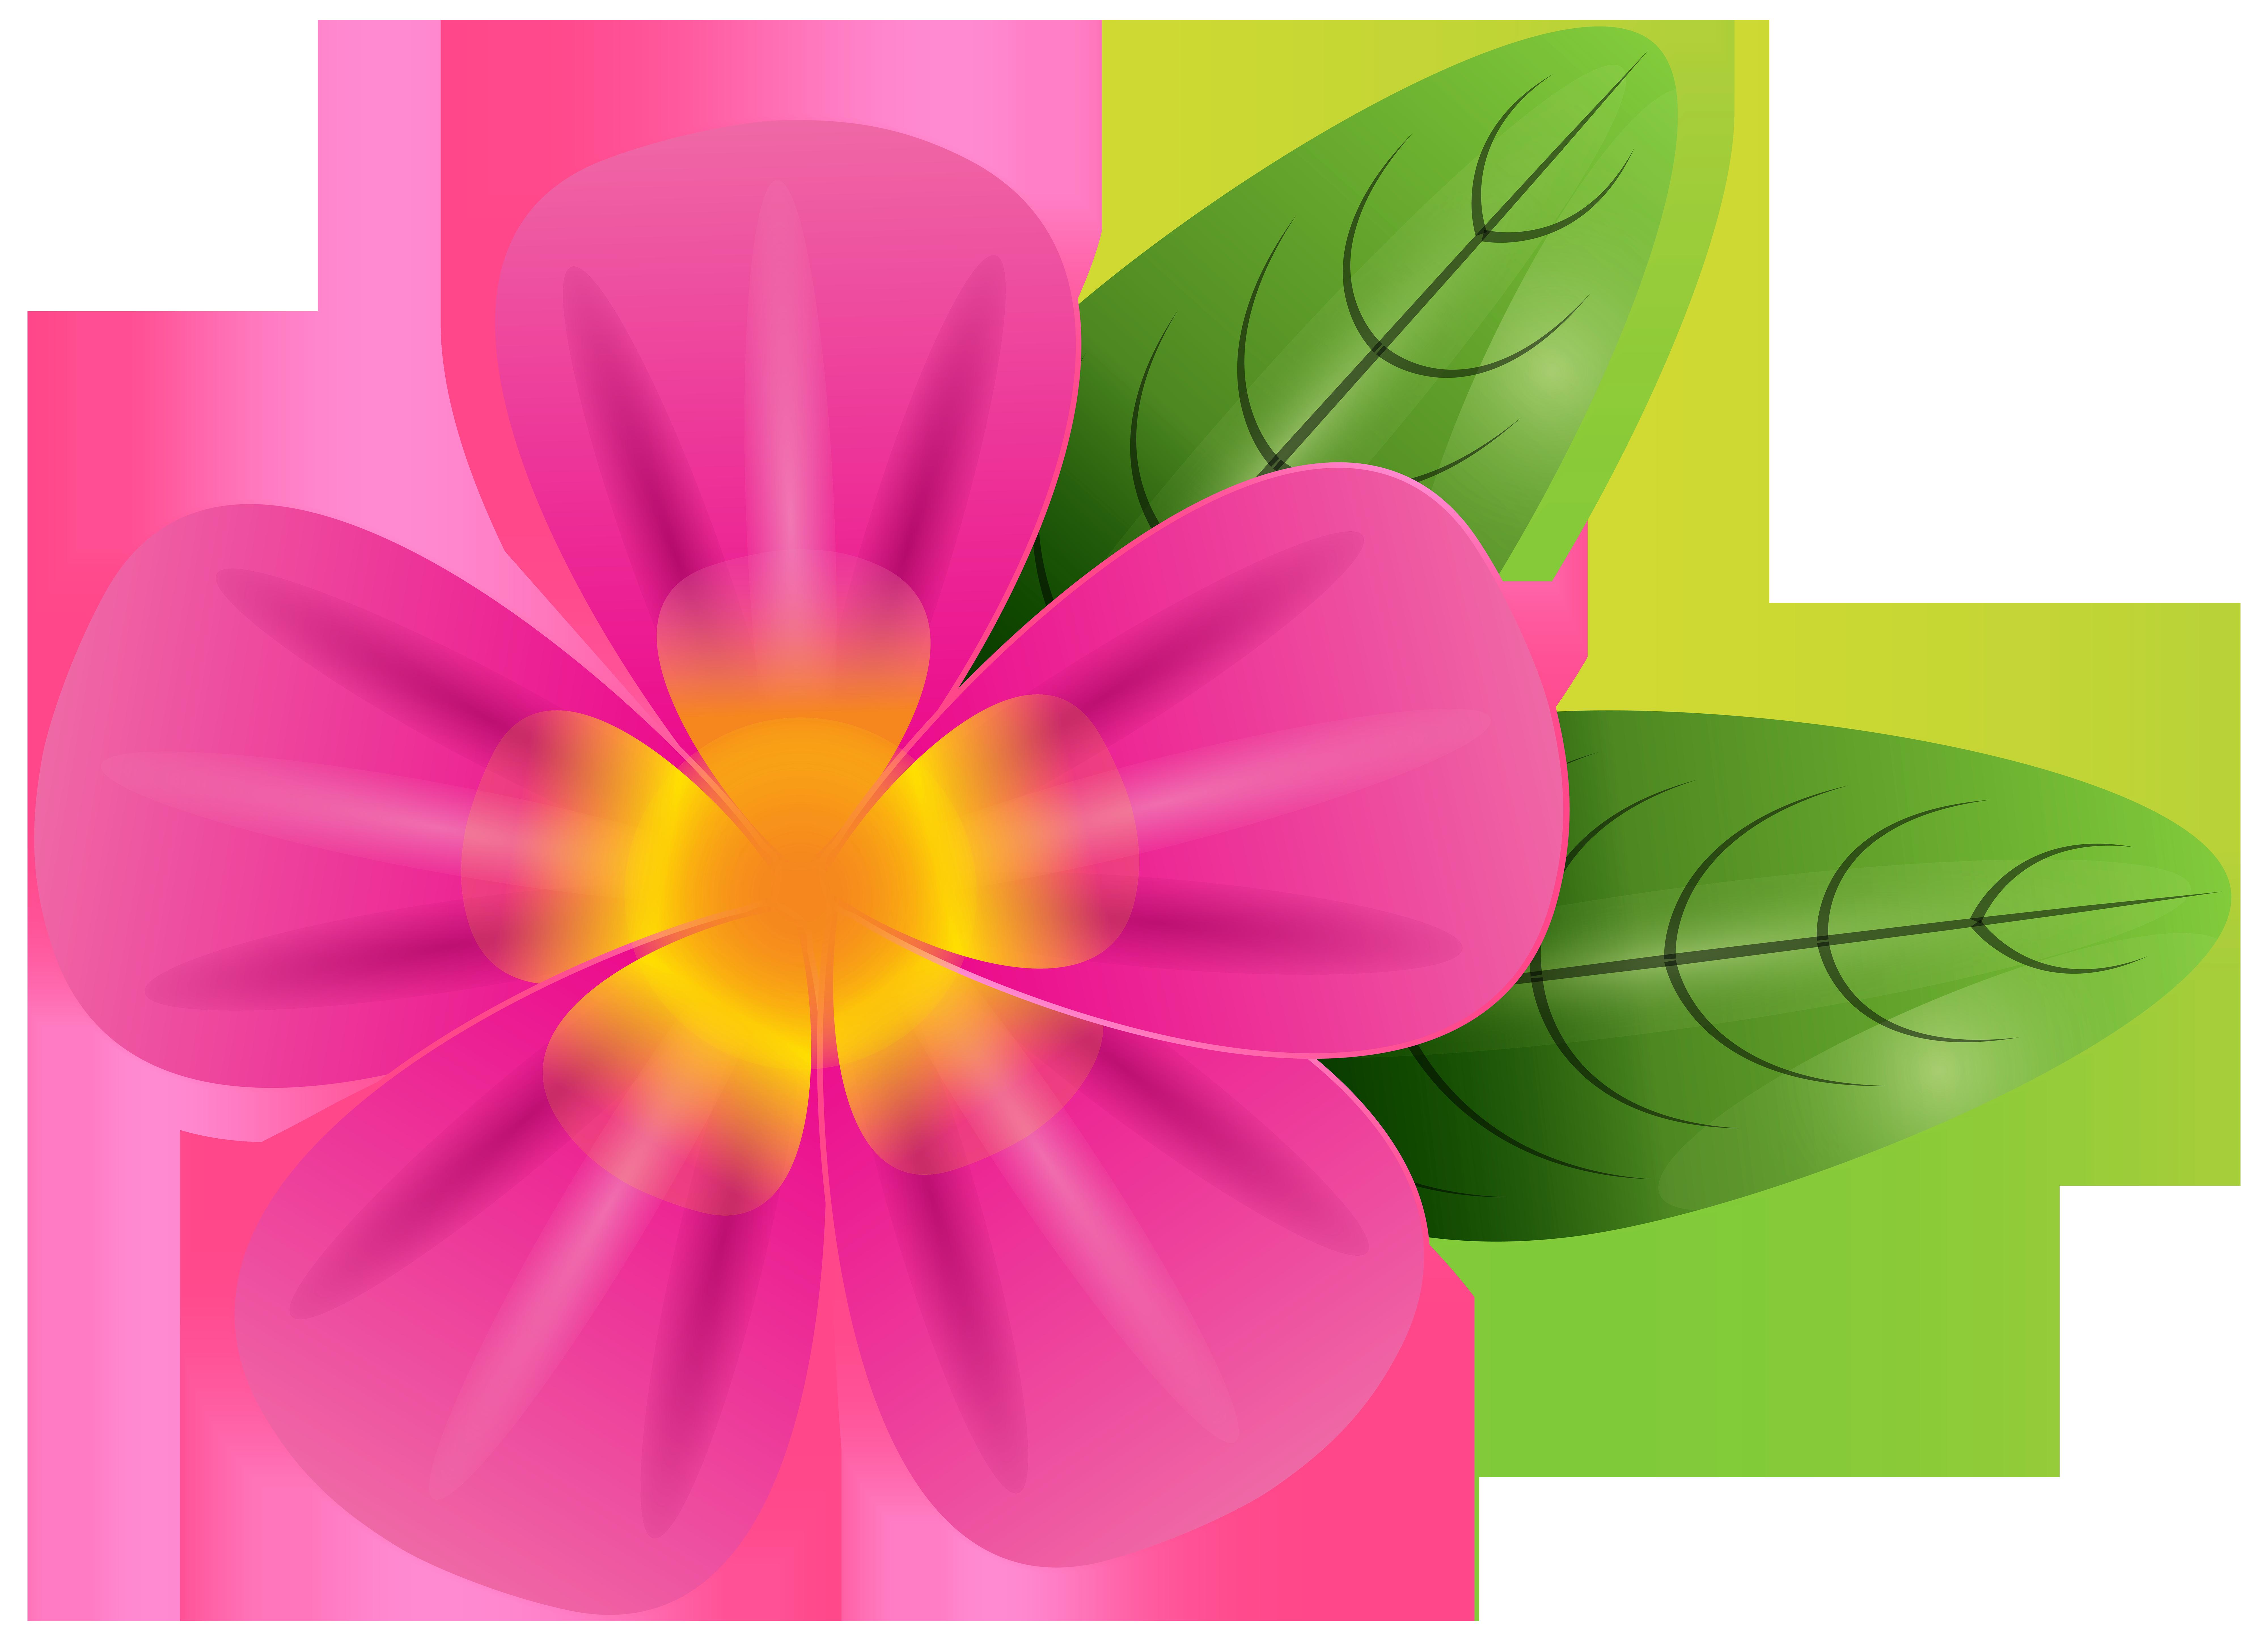 Pink Tropic Flower PNG Clip Art Image.